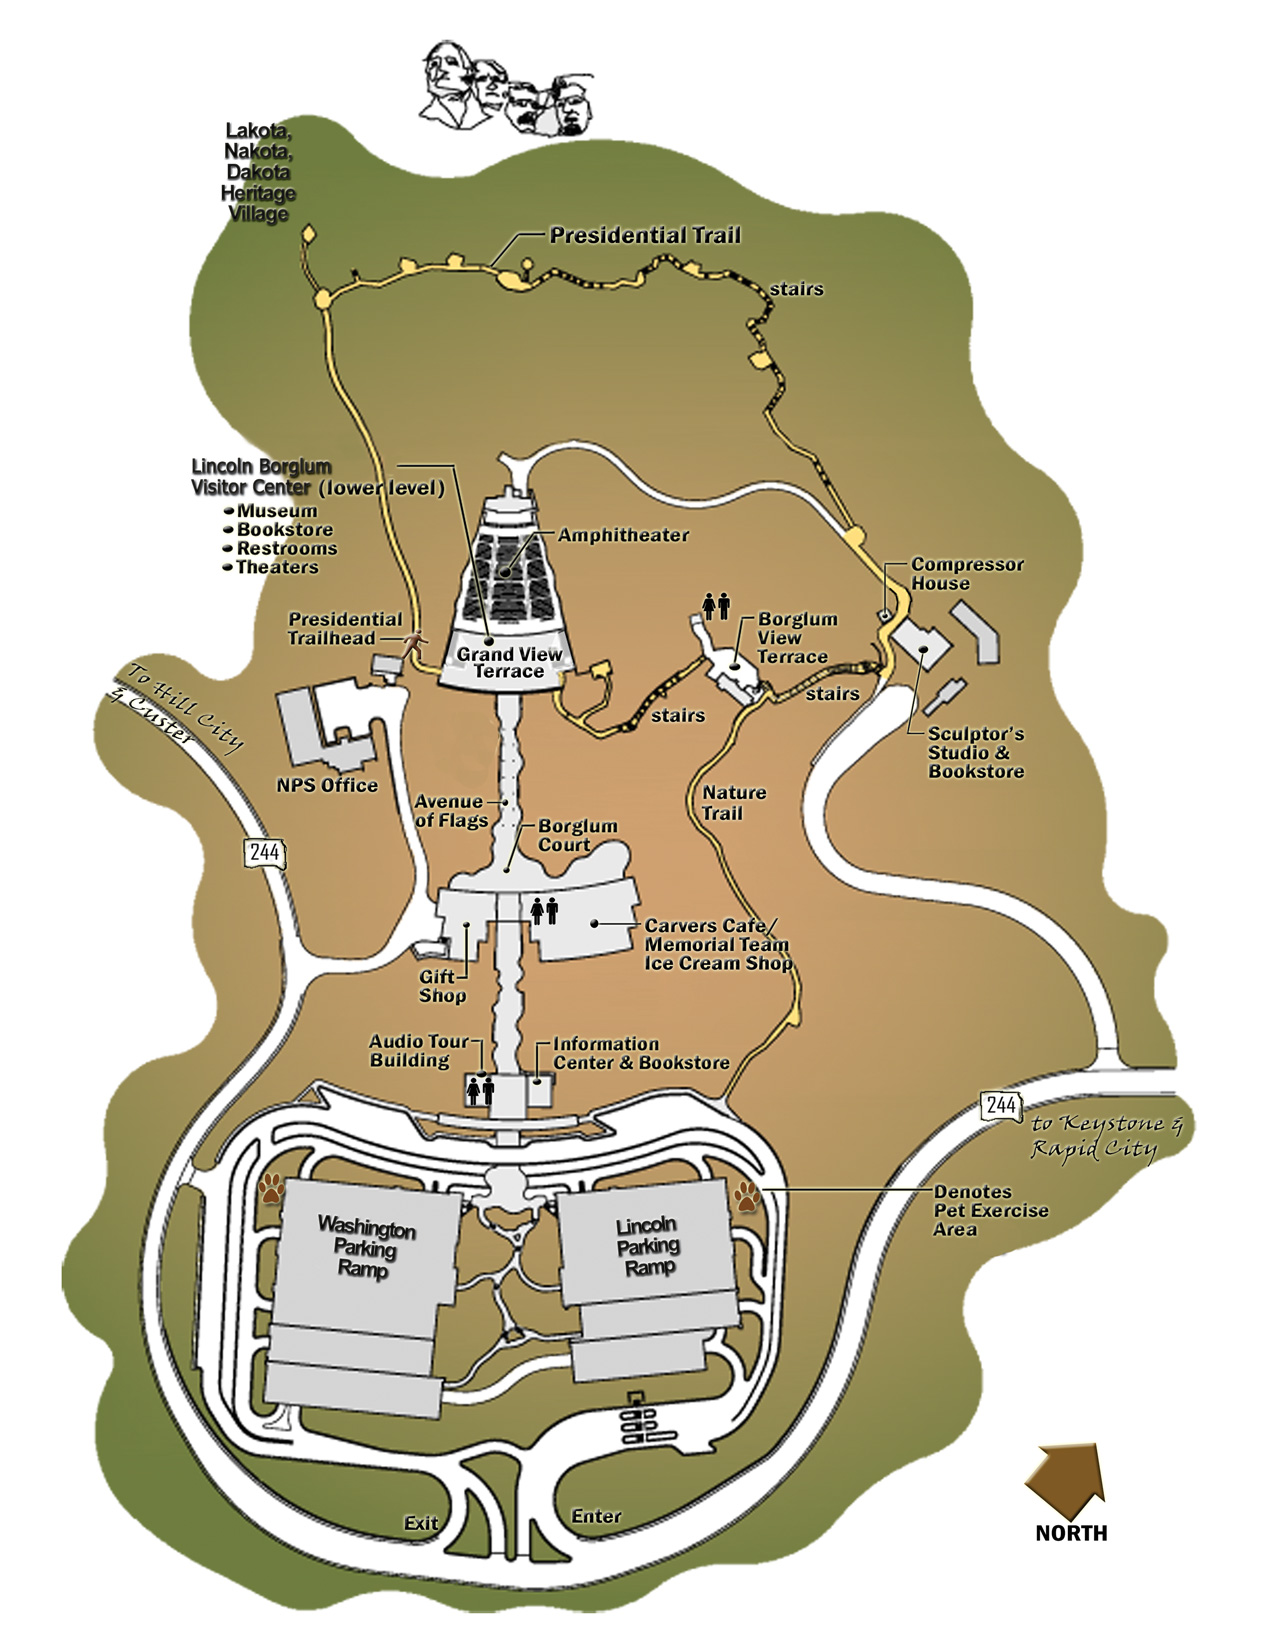 Mt Rushmore Map Mount Rushmore Maps | NPMaps.  just free maps, period. Mt Rushmore Map